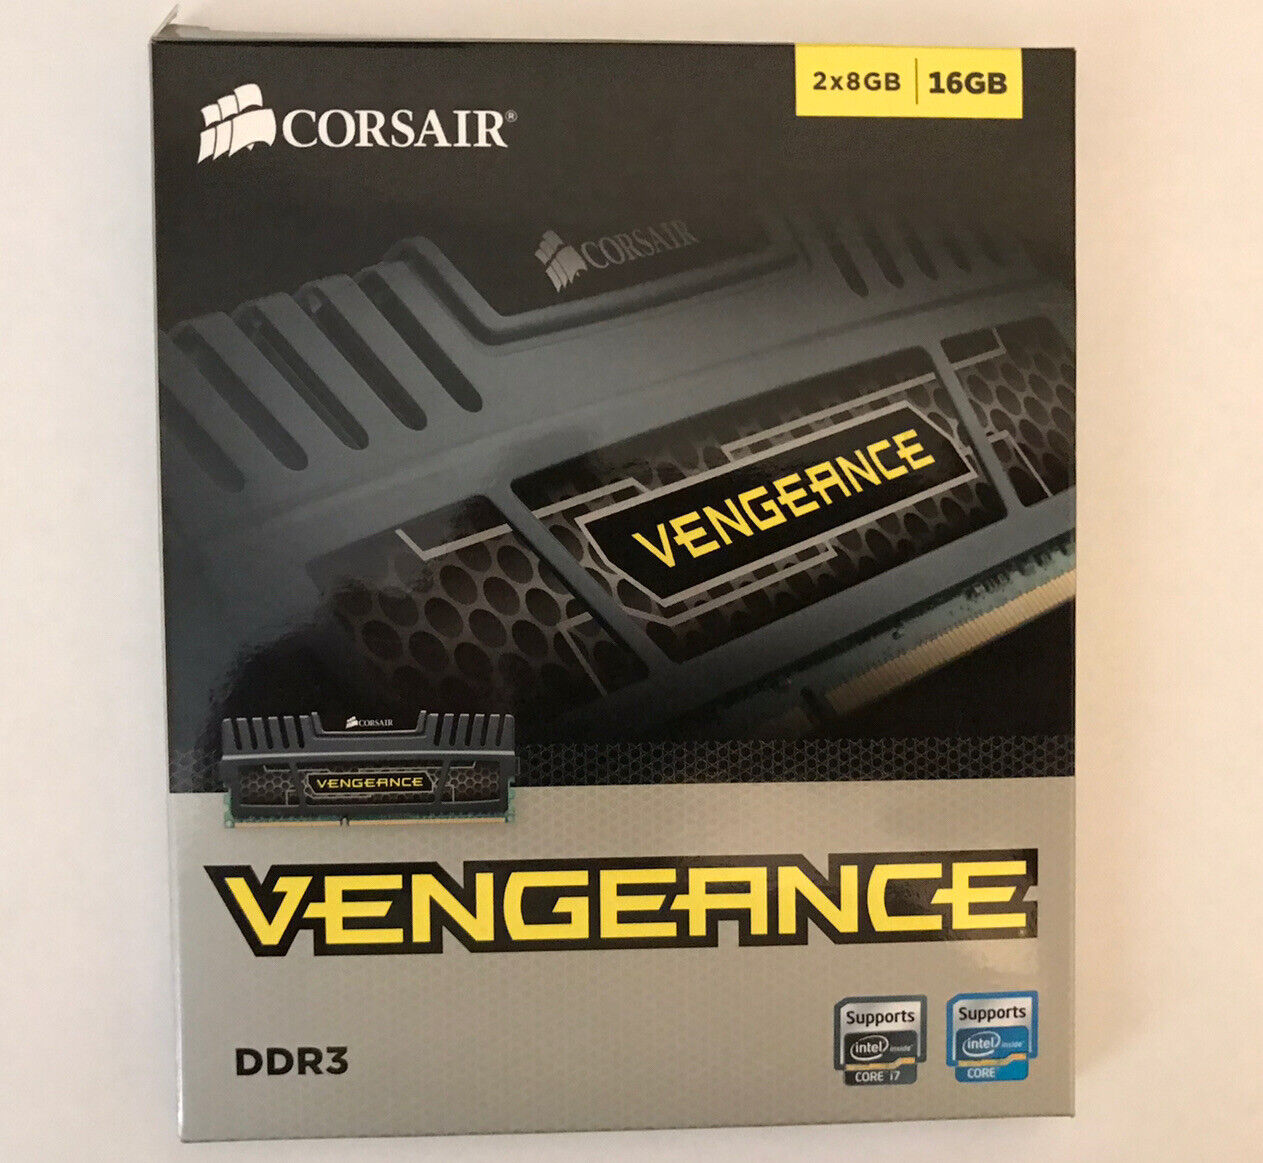 Corsair Vengeance 16gb 2 X 8gb Ddr3 Pc3 12800 Memory Module Cmz16gx3m2a1600c10 For Sale Online Ebay